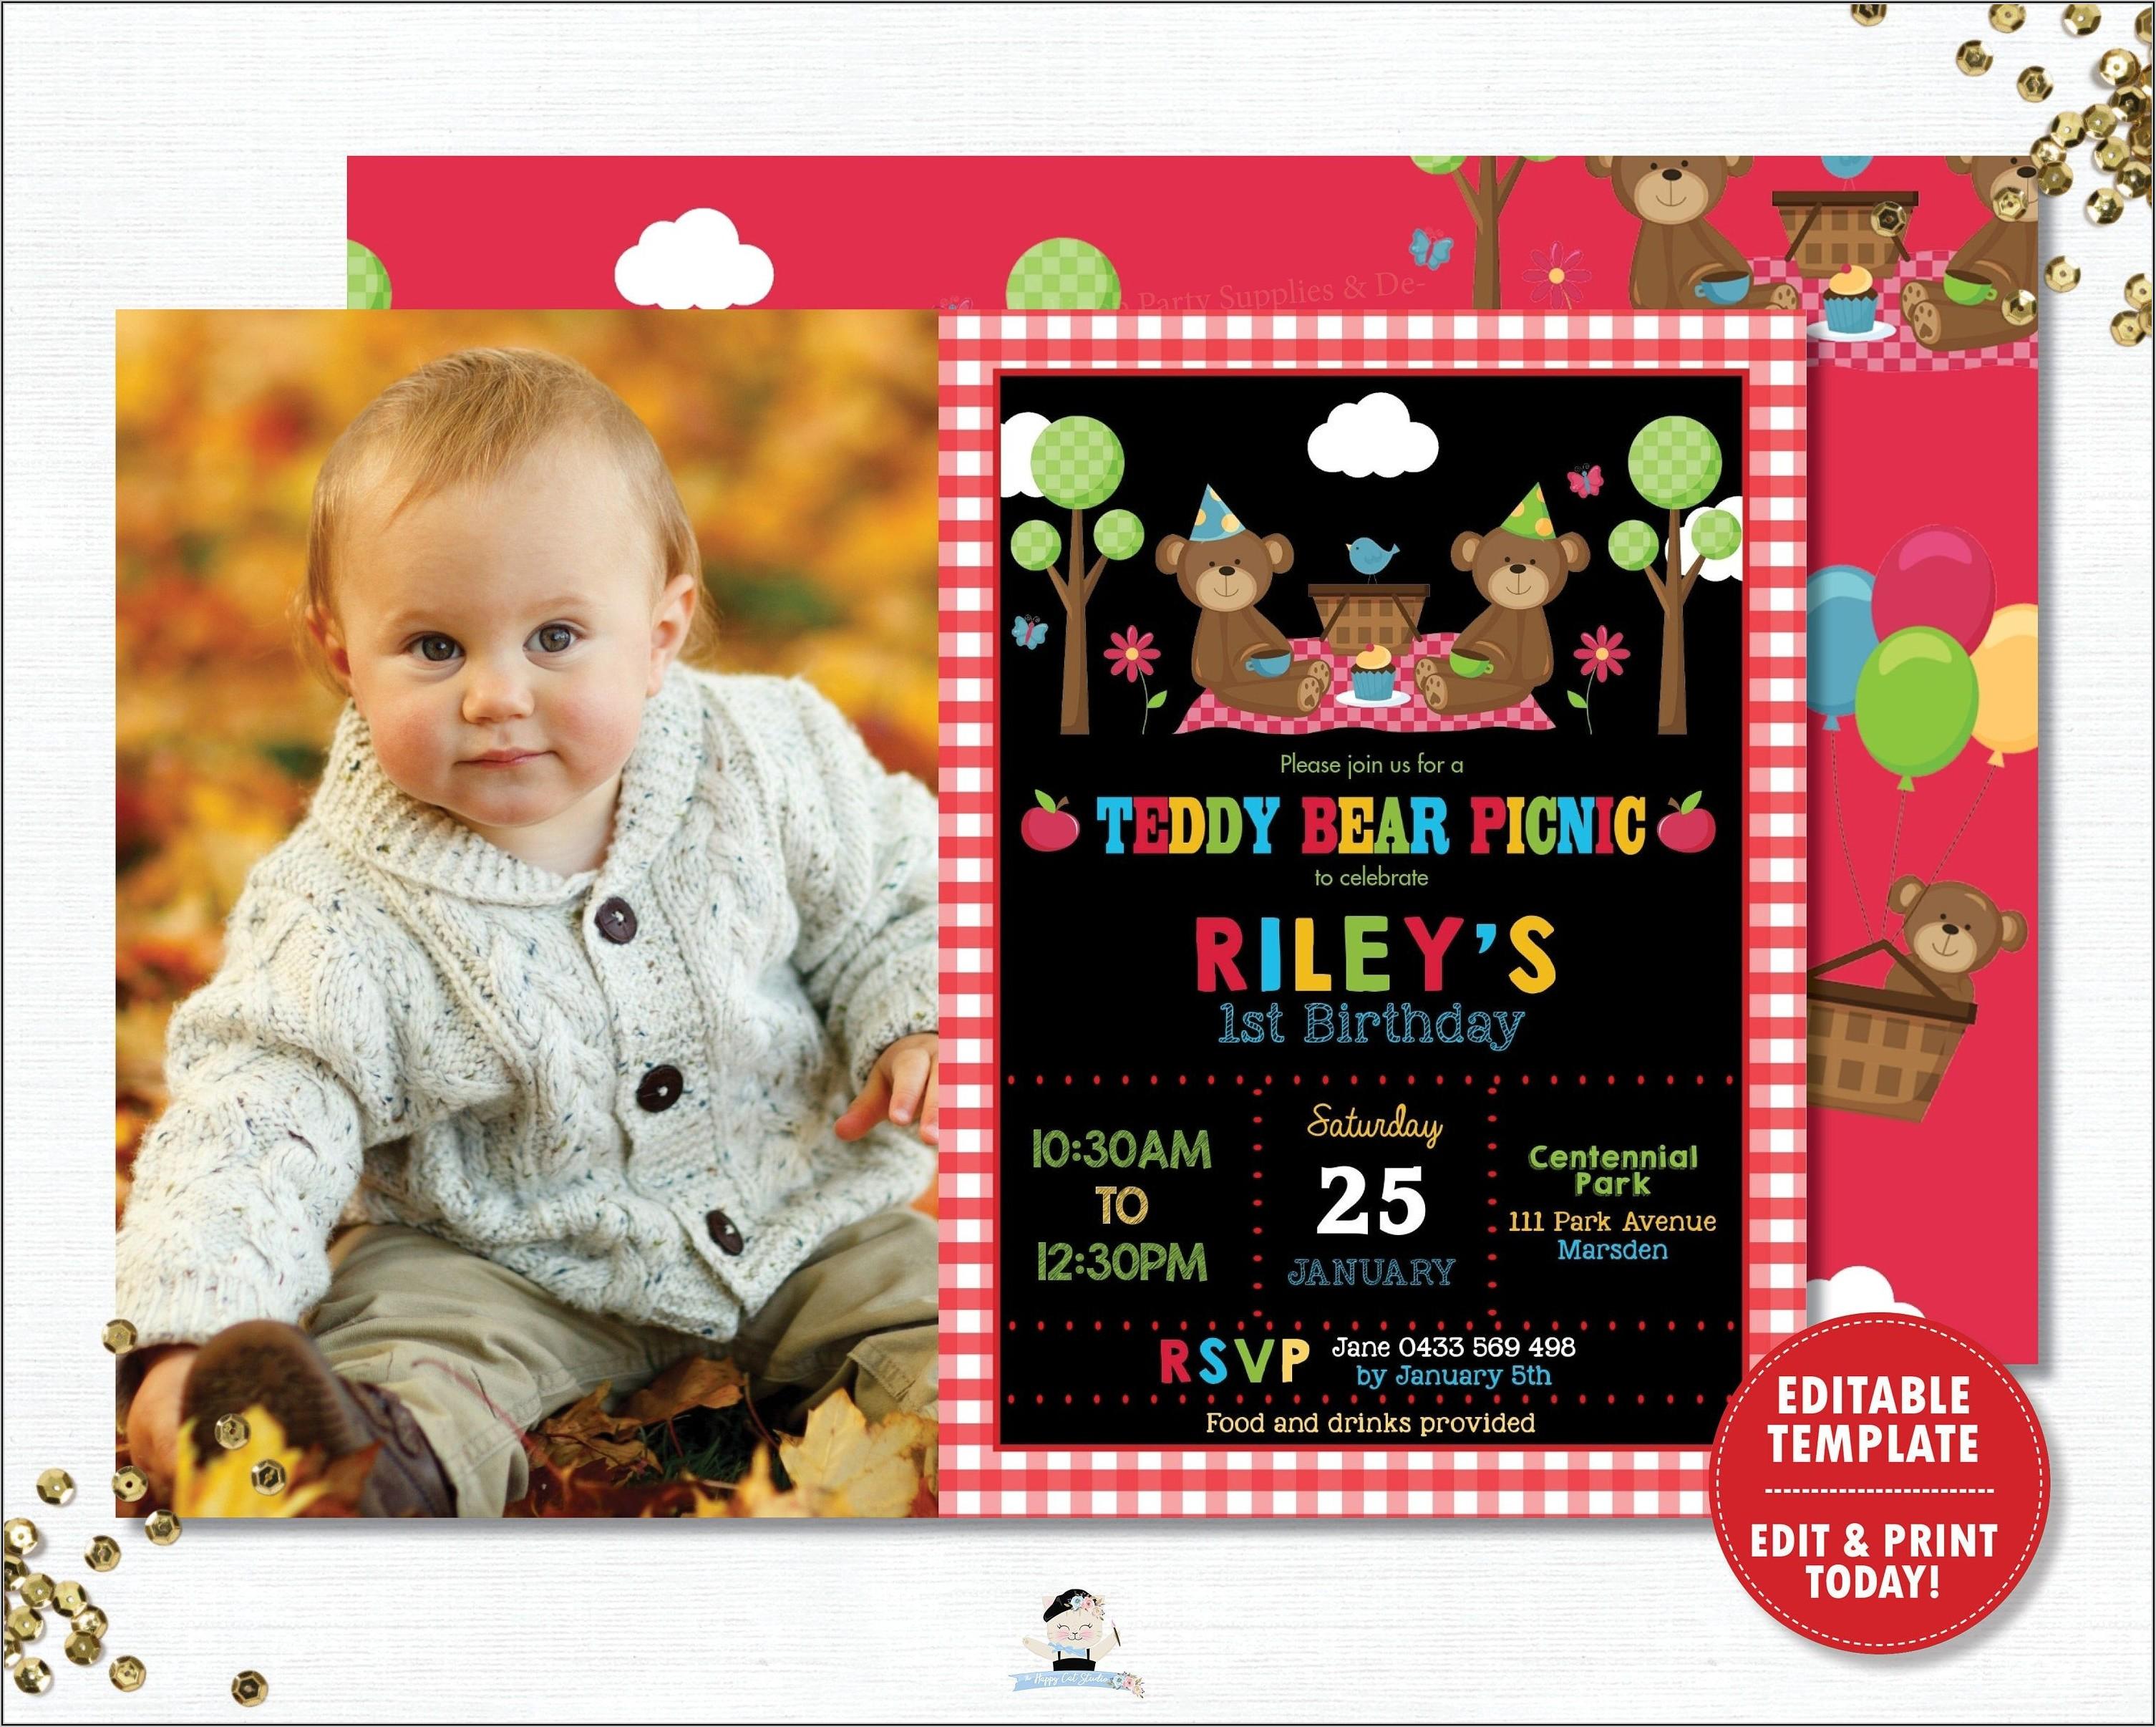 Teddy Bear Picnic Invitation Template